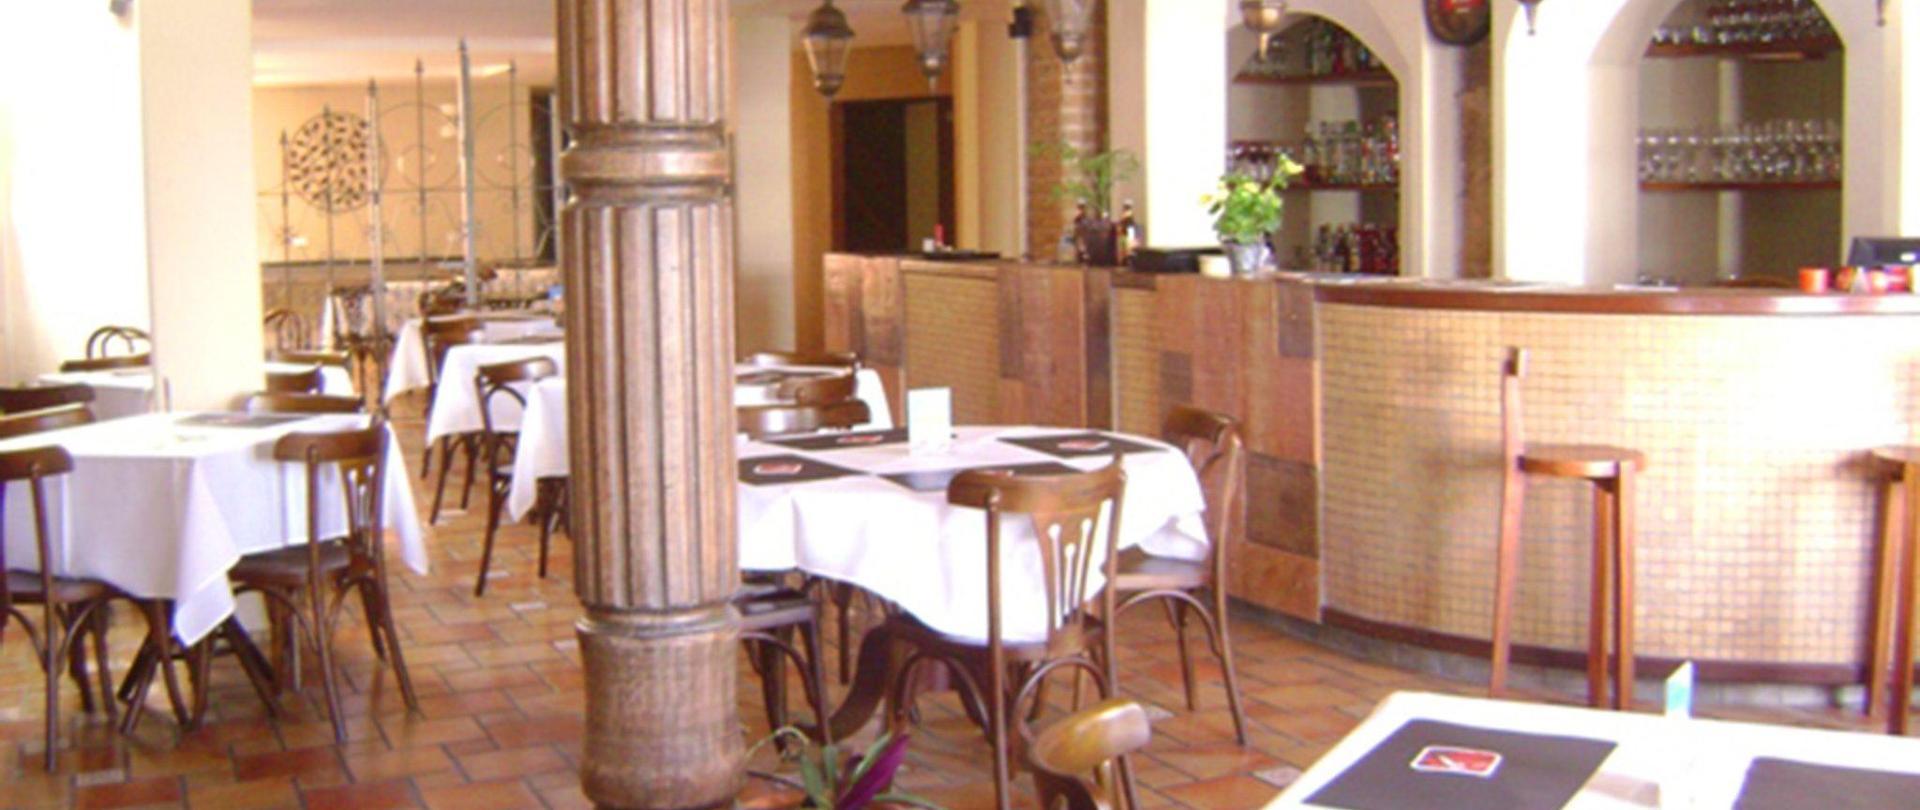 bae-e-restaurante-001-1.jpg